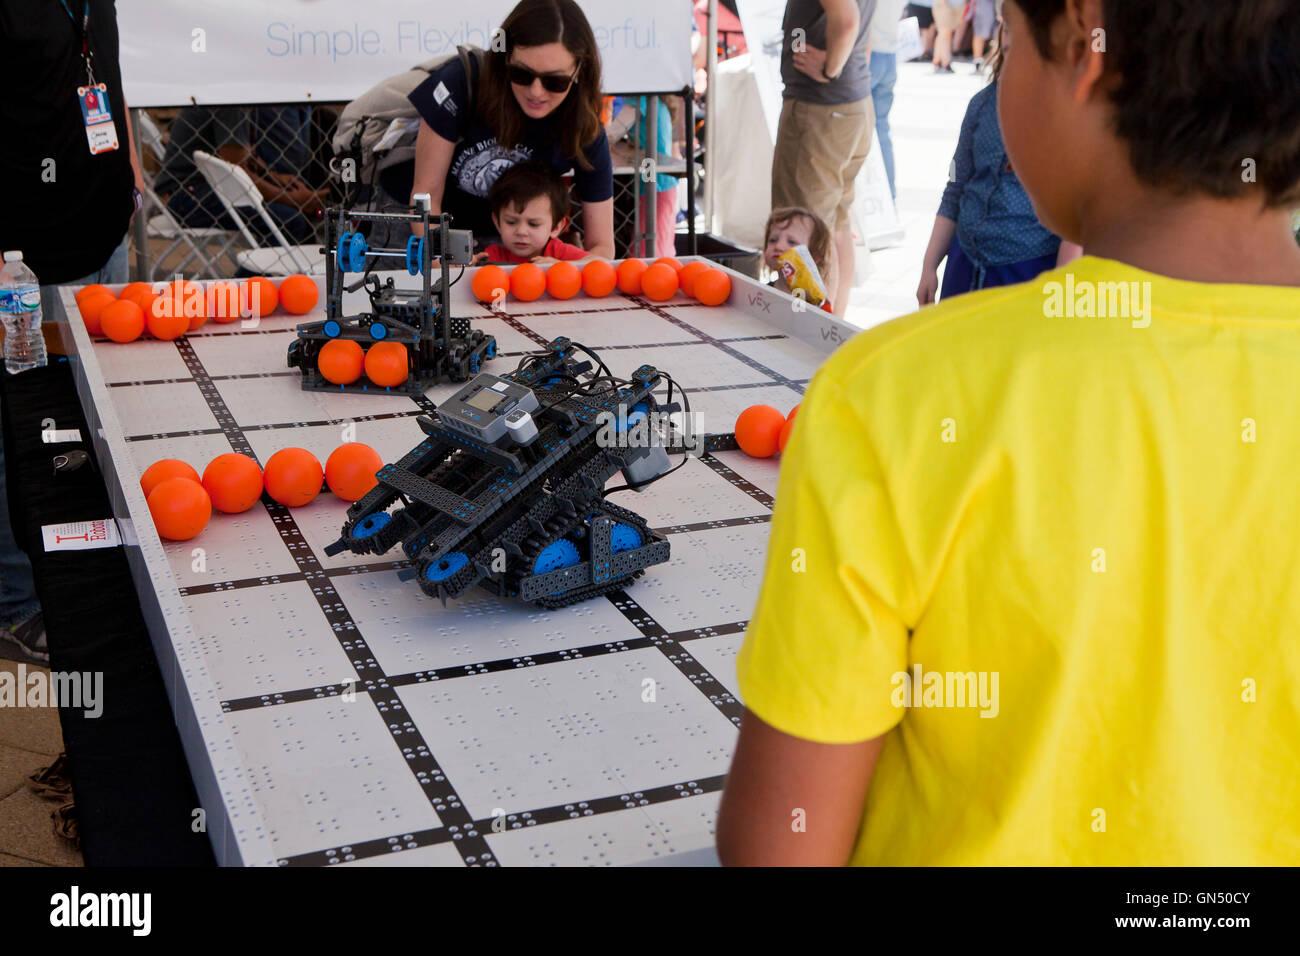 Schoolchild controlling a robot at Maker Faire - Washington, DC USA - Stock Image